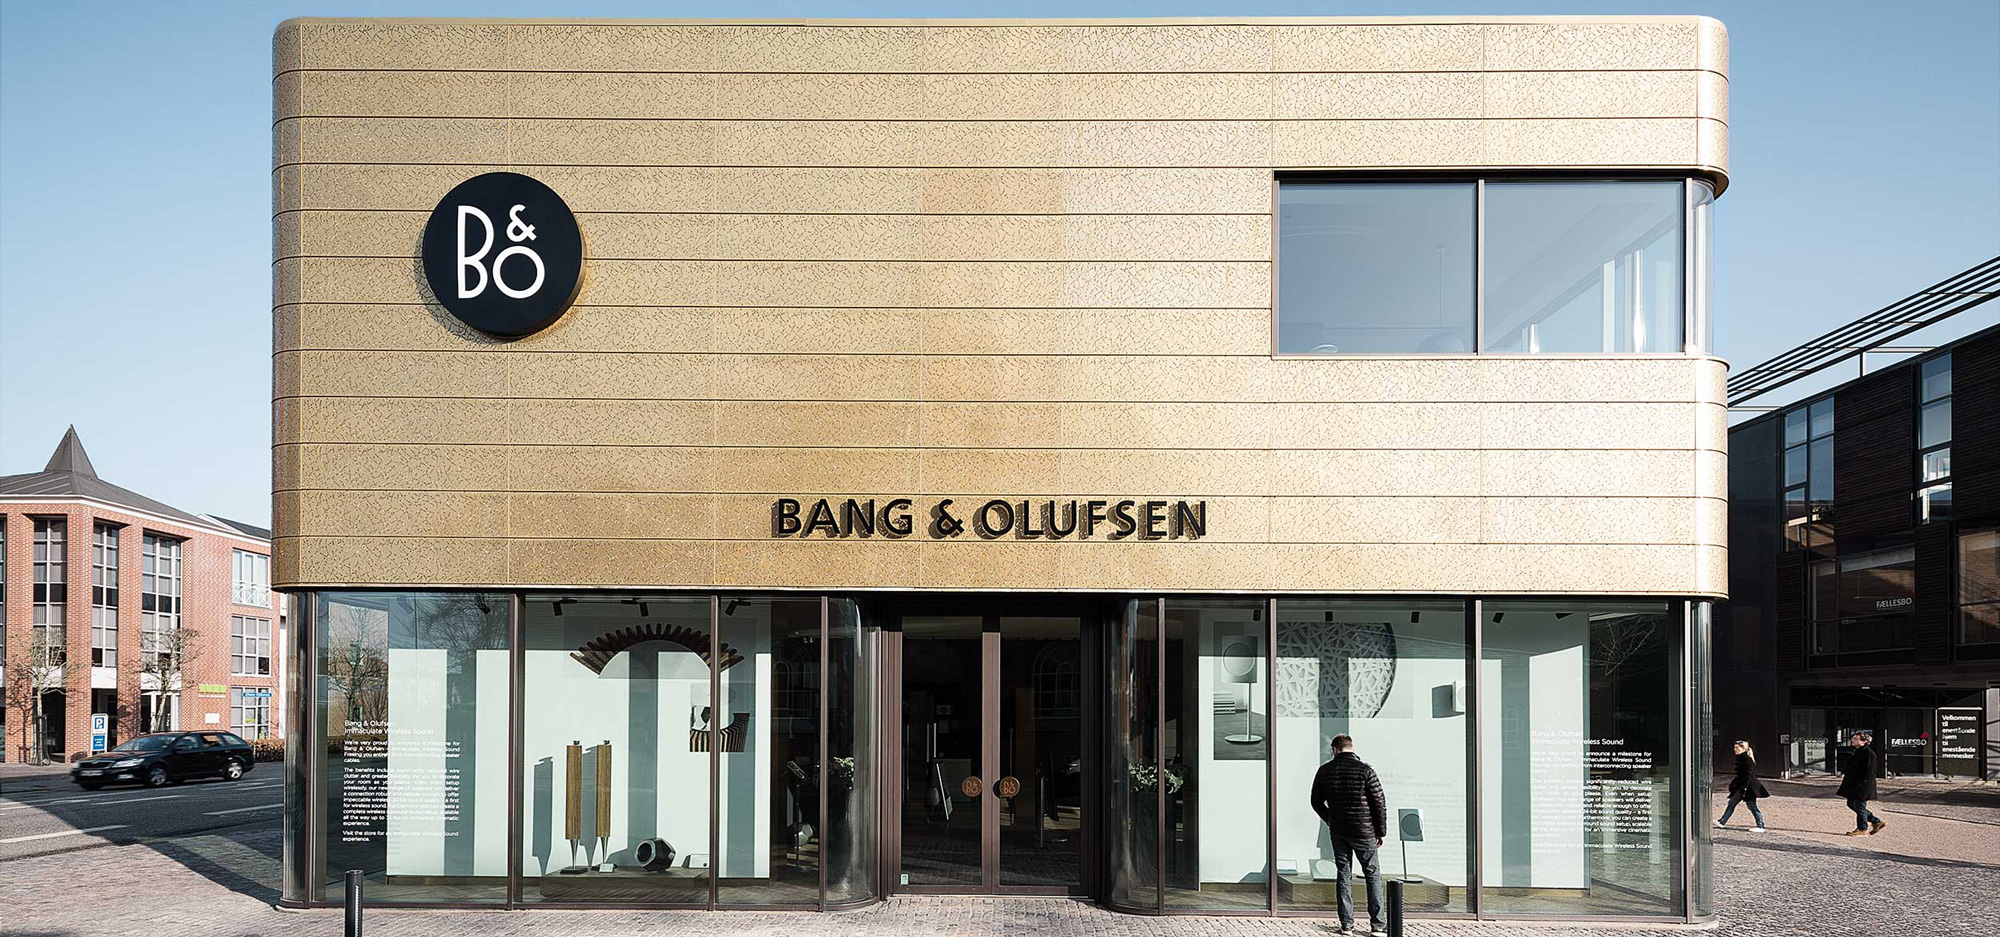 Bang & Olufsen store at Nexus house of Sound & Vision in Herning, Denmark designed by interior design agency Johannes Torpe Studios